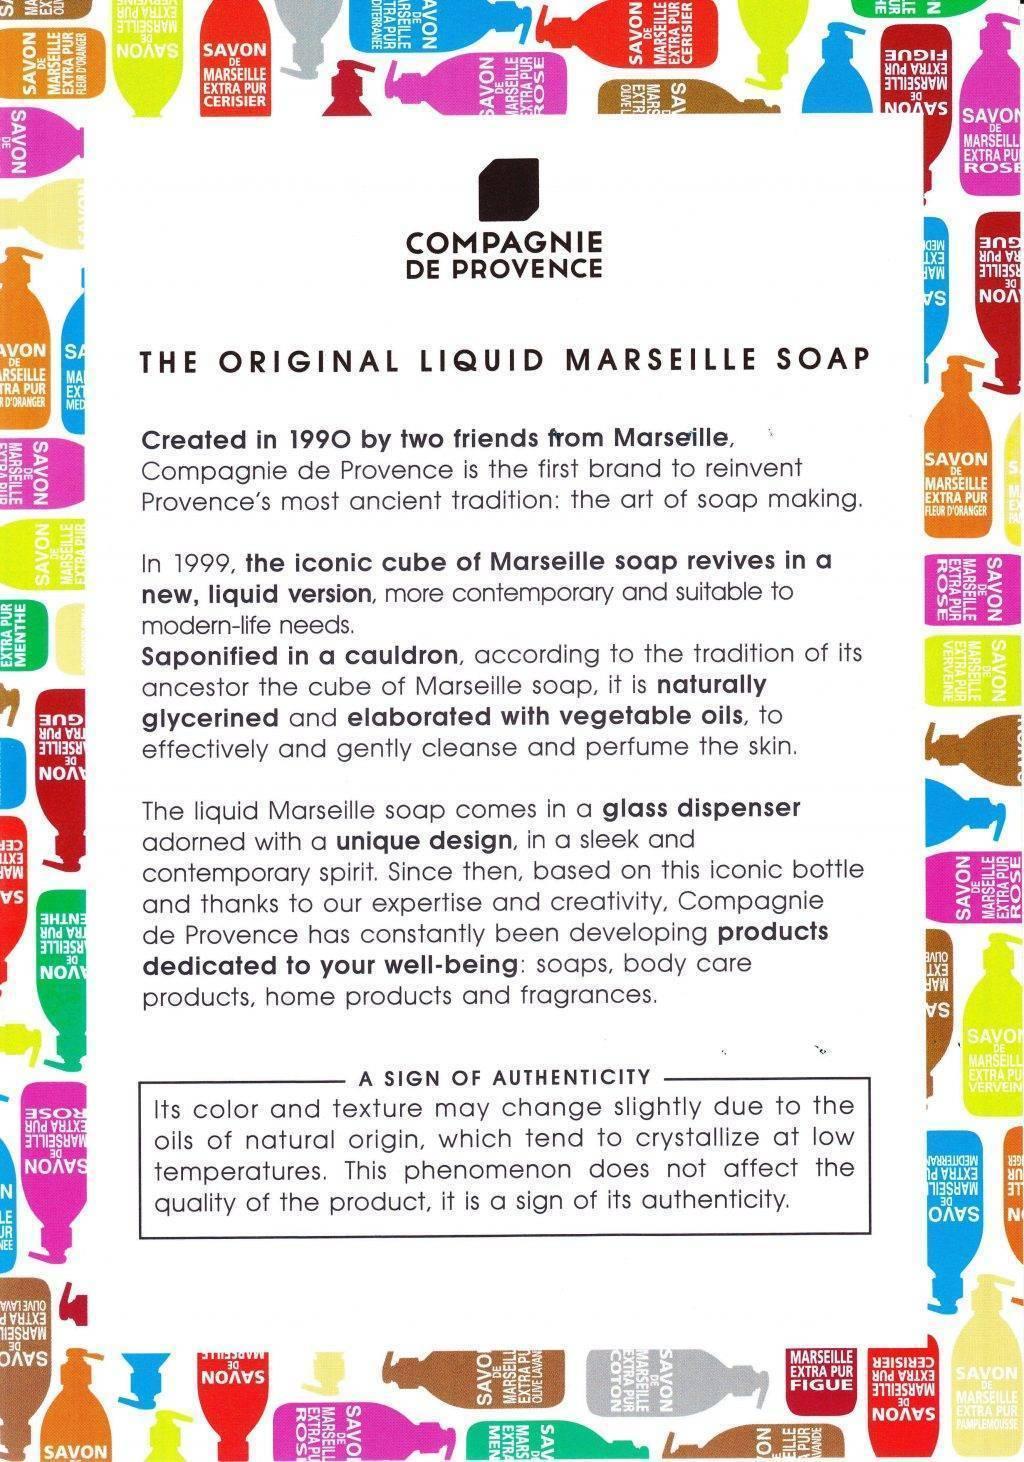 Compagnie-de-Provence-The-Original-Liquid-Marseille-Soap